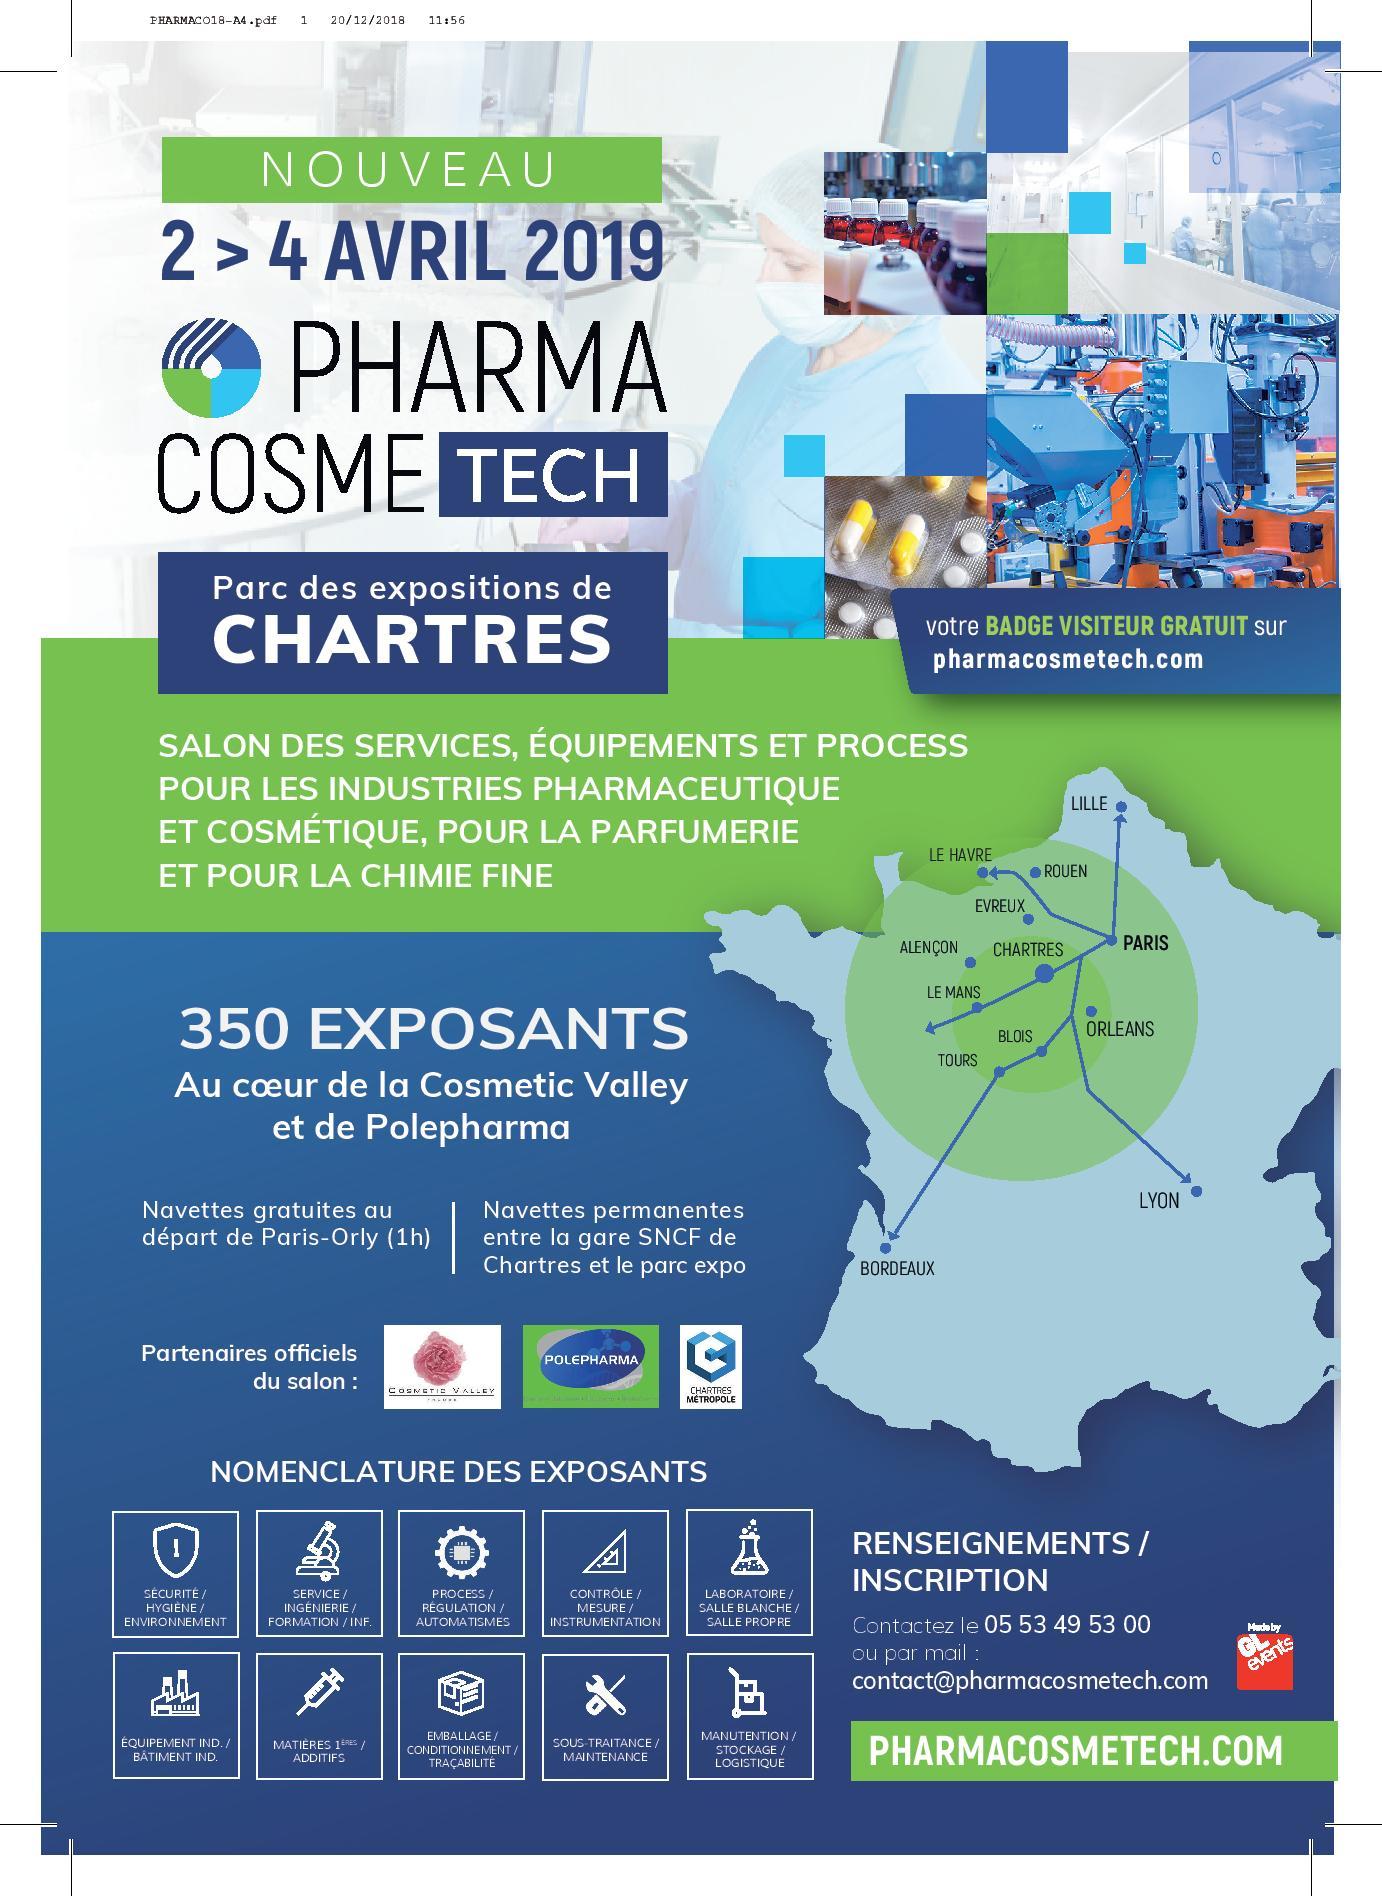 pharma-cosmetech-2019